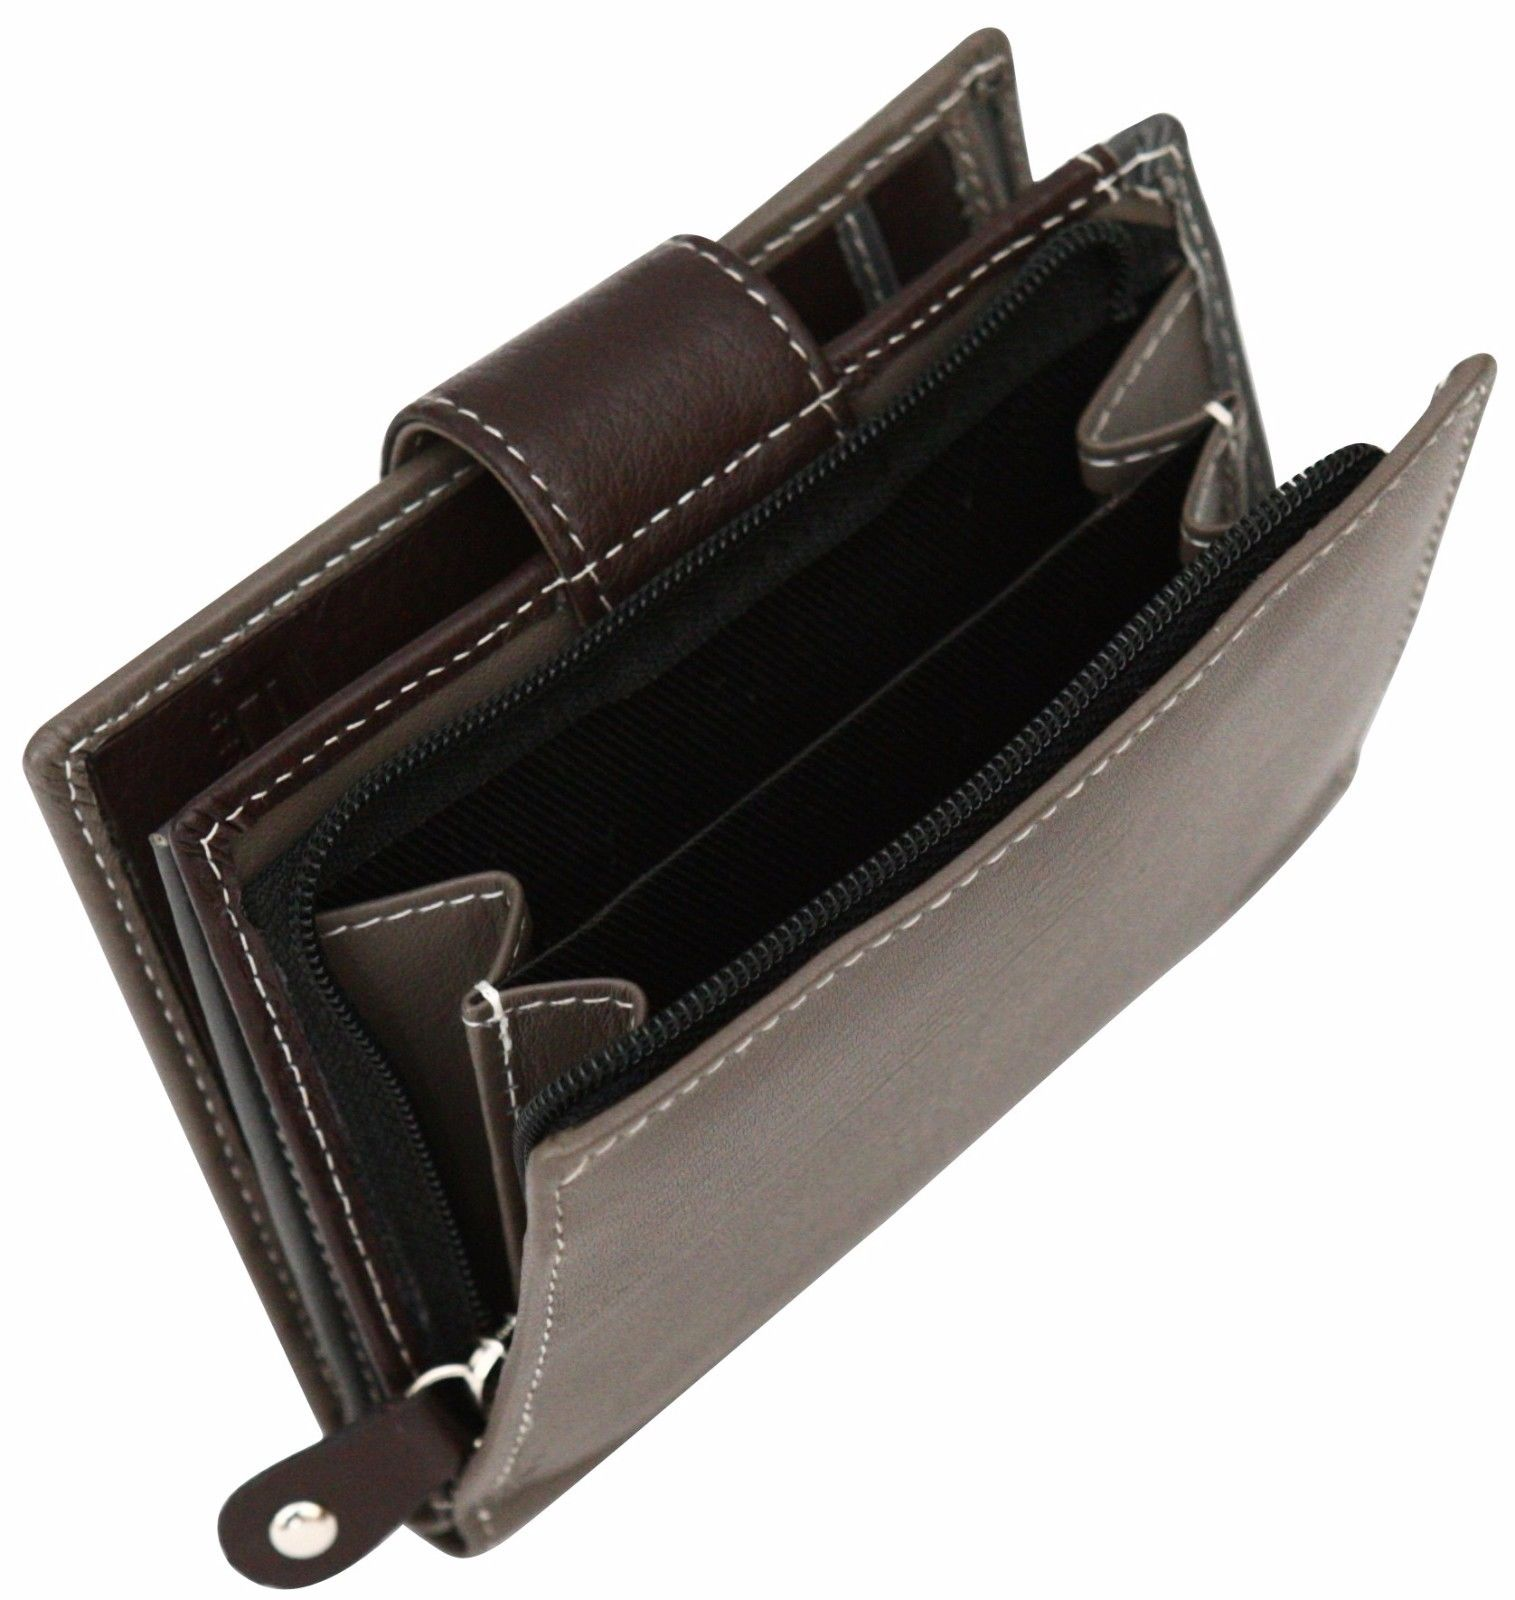 Felda-RFID-onorevoli-MEDAGLIA-amp-Card-Purse-Wallet-Genuine-Leather-Multi-SOFT-BOX-REGALO miniatura 59